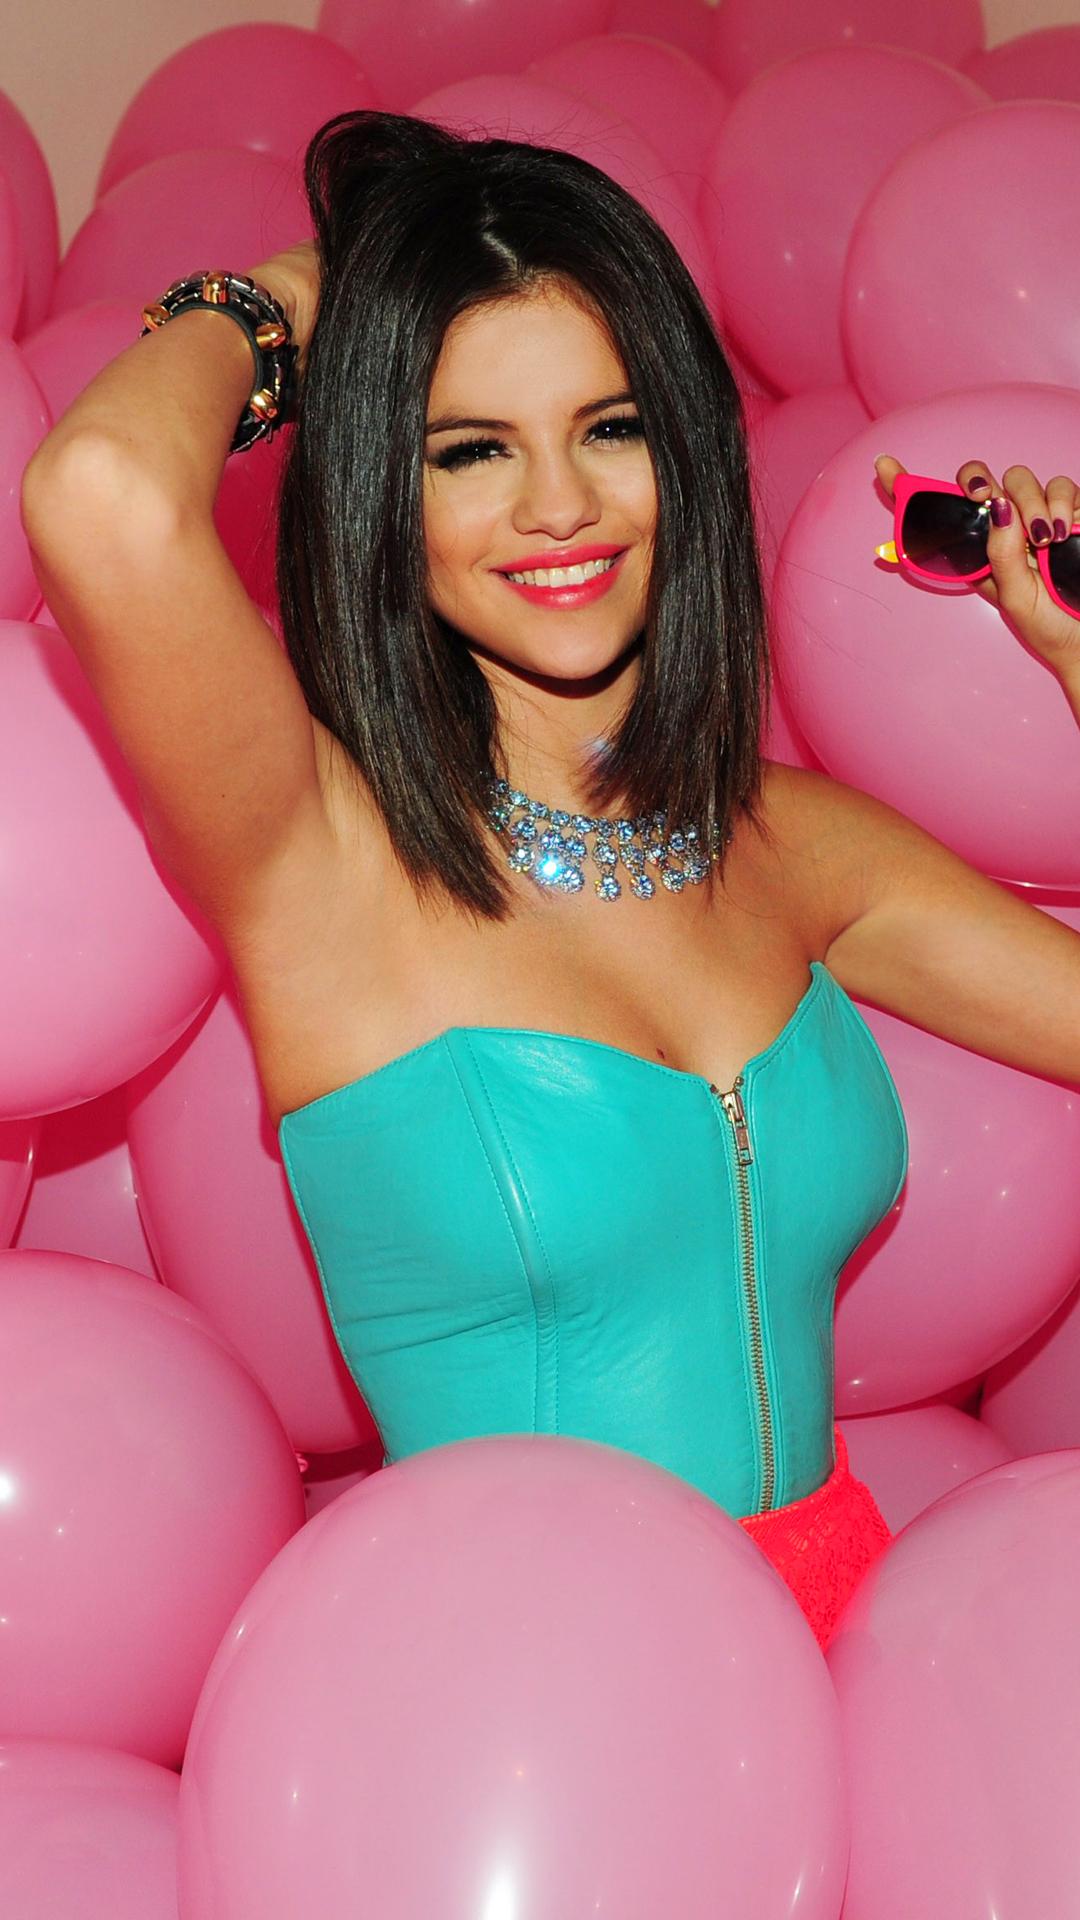 Selena Gomez htc one wallpaper